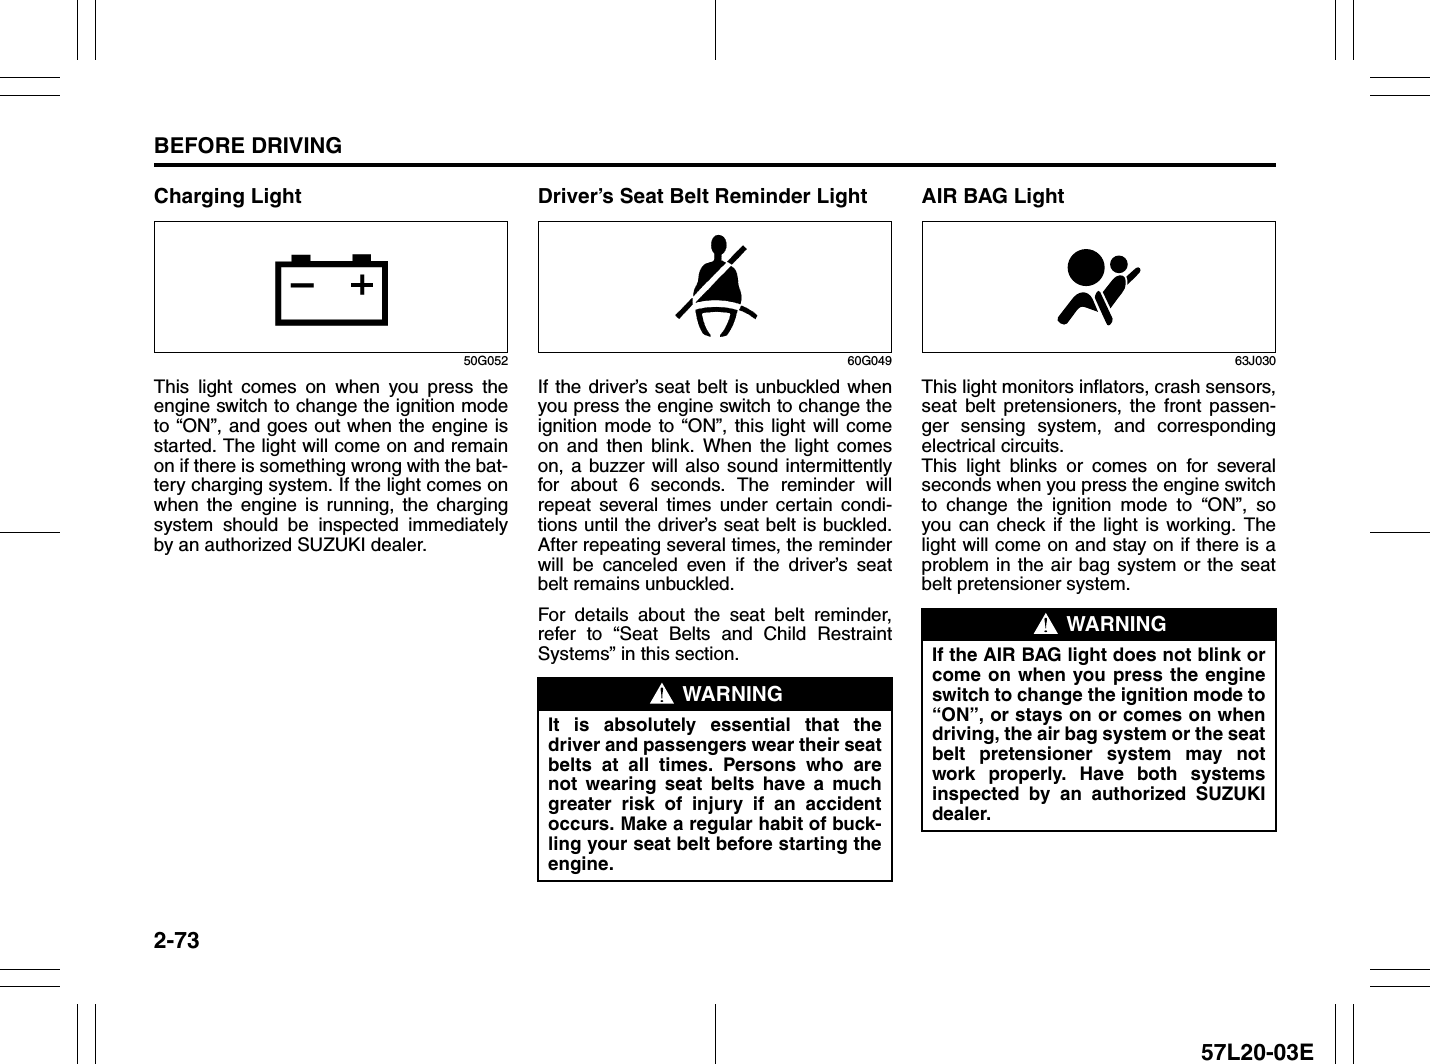 Suzuki 2010 Kizashi Owners Manual 13